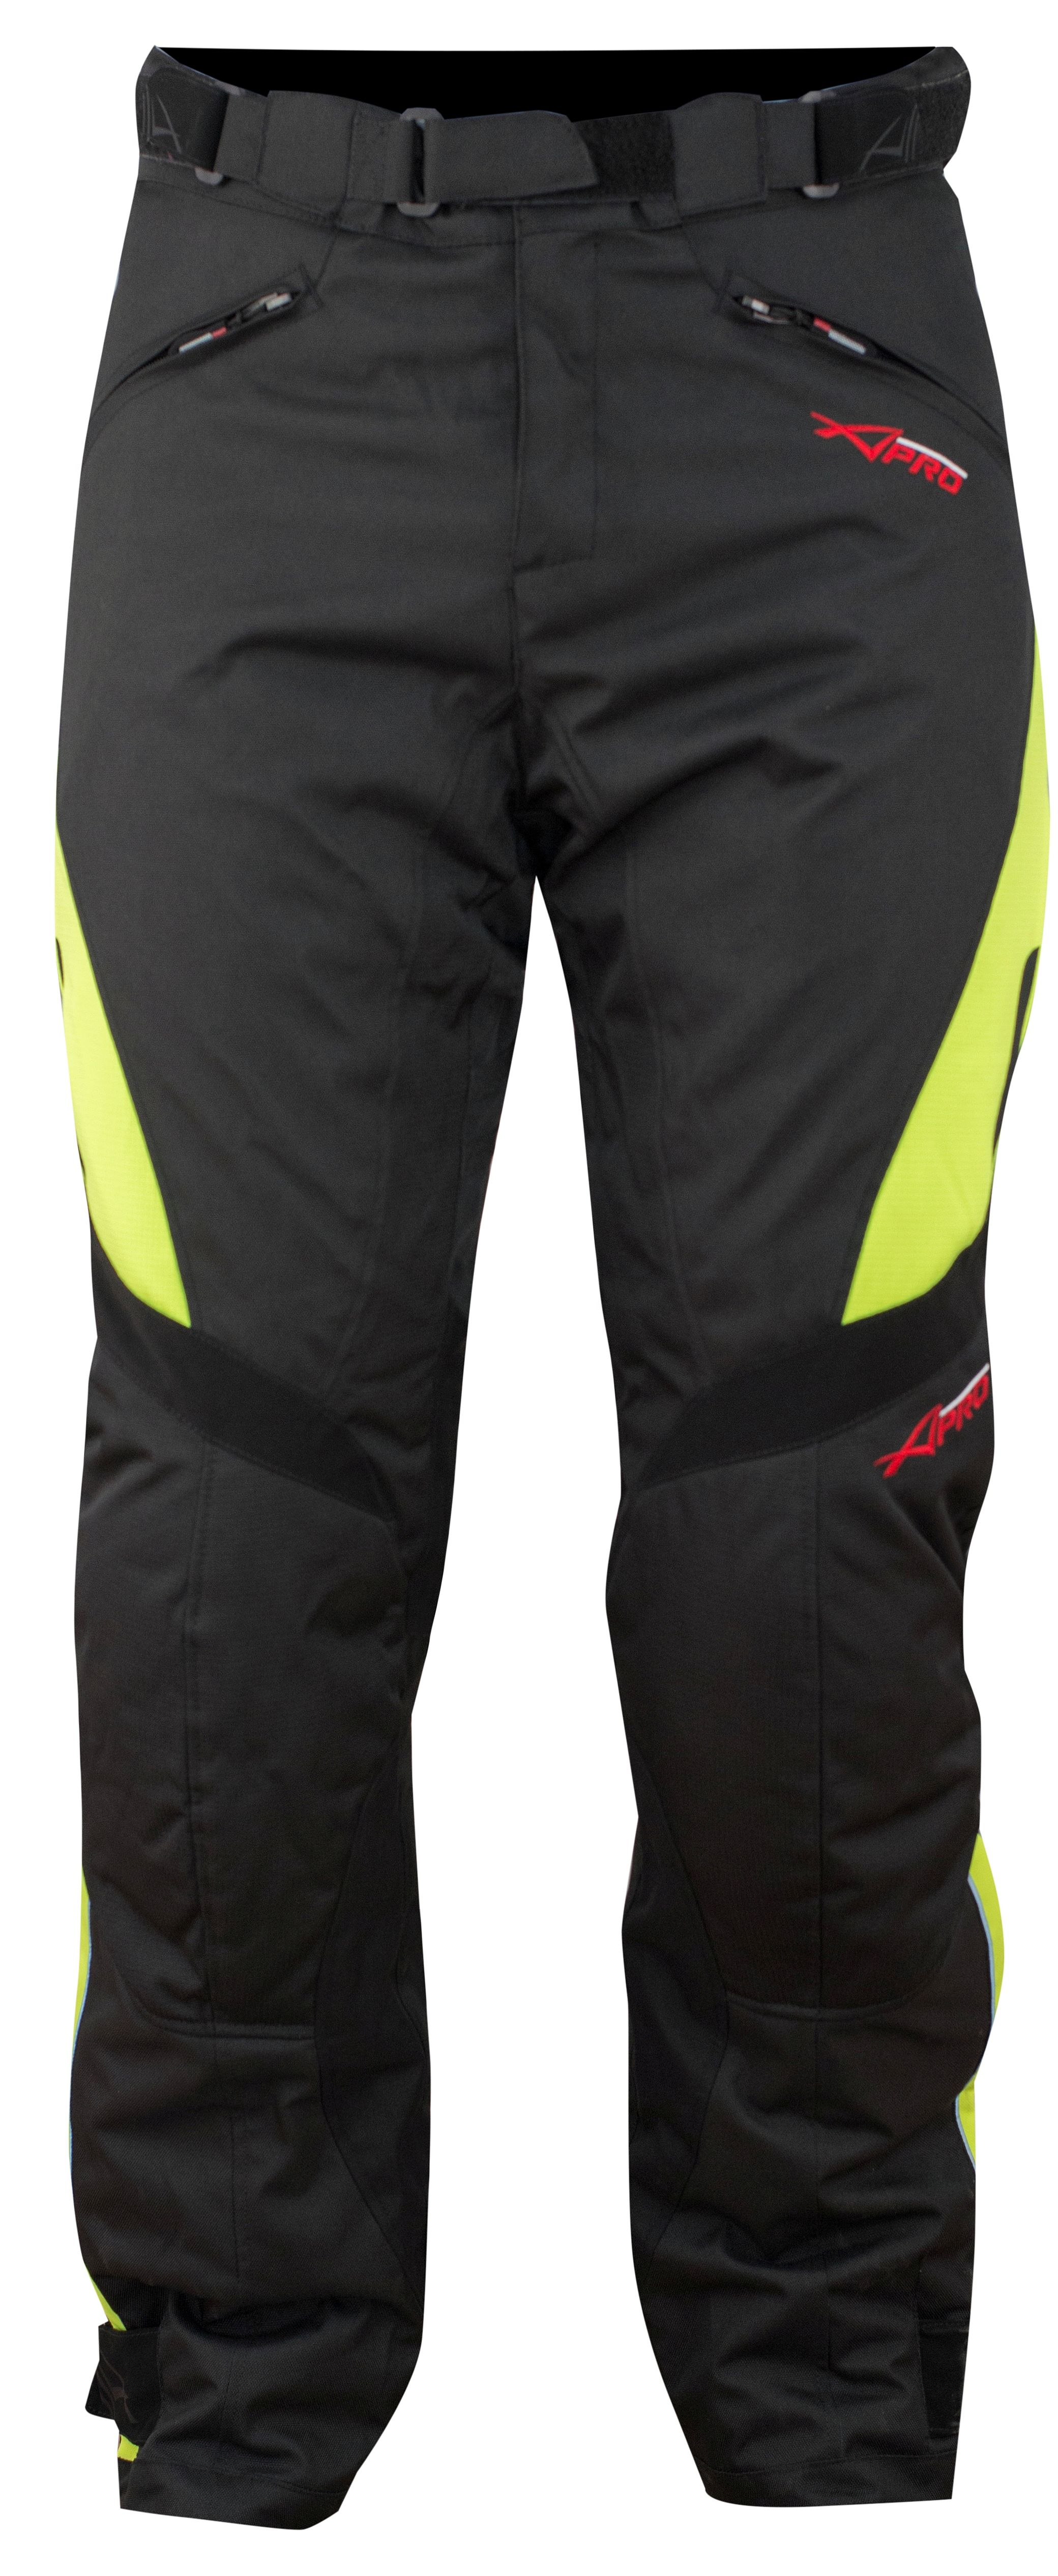 Pantaloni-Donna-Impermeabile-Moto-Imbottitura-Termica-Traspirante-Fluo miniature 9